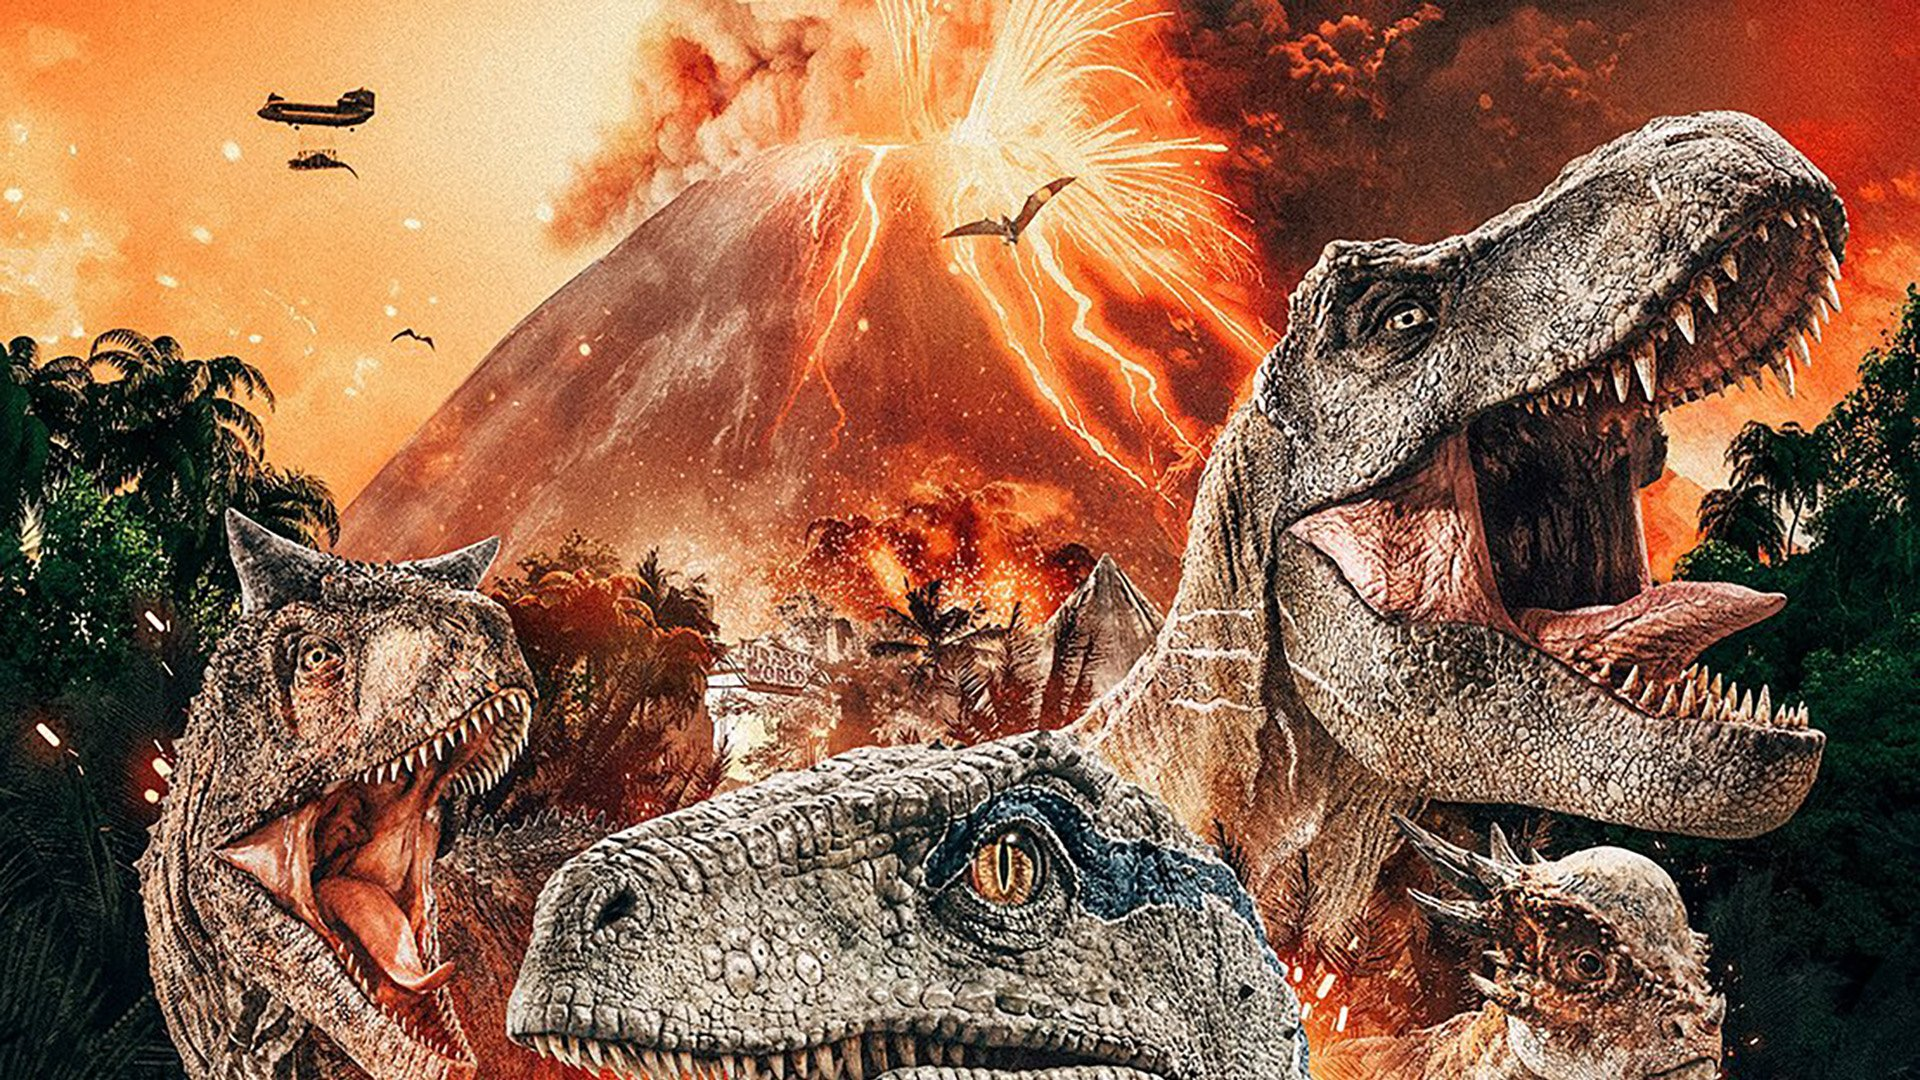 Jurassic World: Fallen Kingdom poster has dinosaurs, is a clusterf*%k screenshot